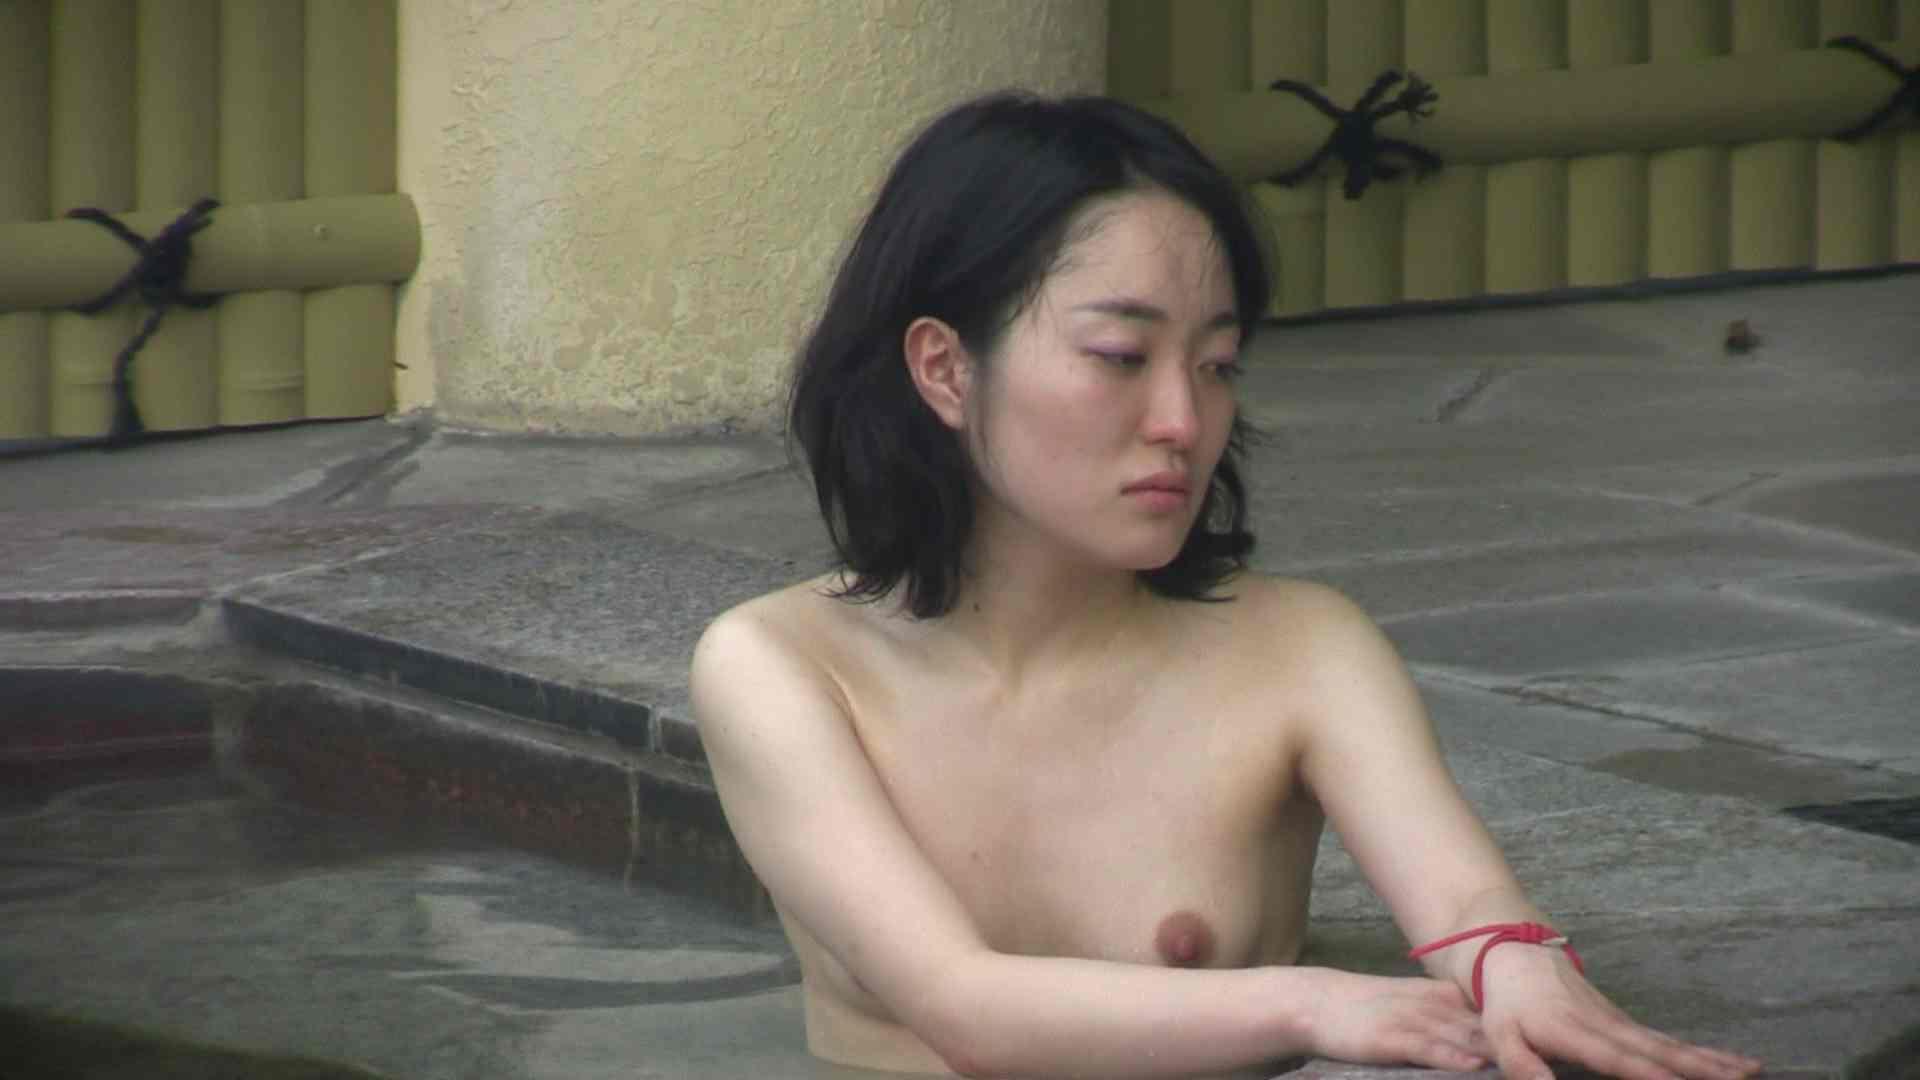 Aquaな露天風呂Vol.681 露天 | OLセックス  98画像 67